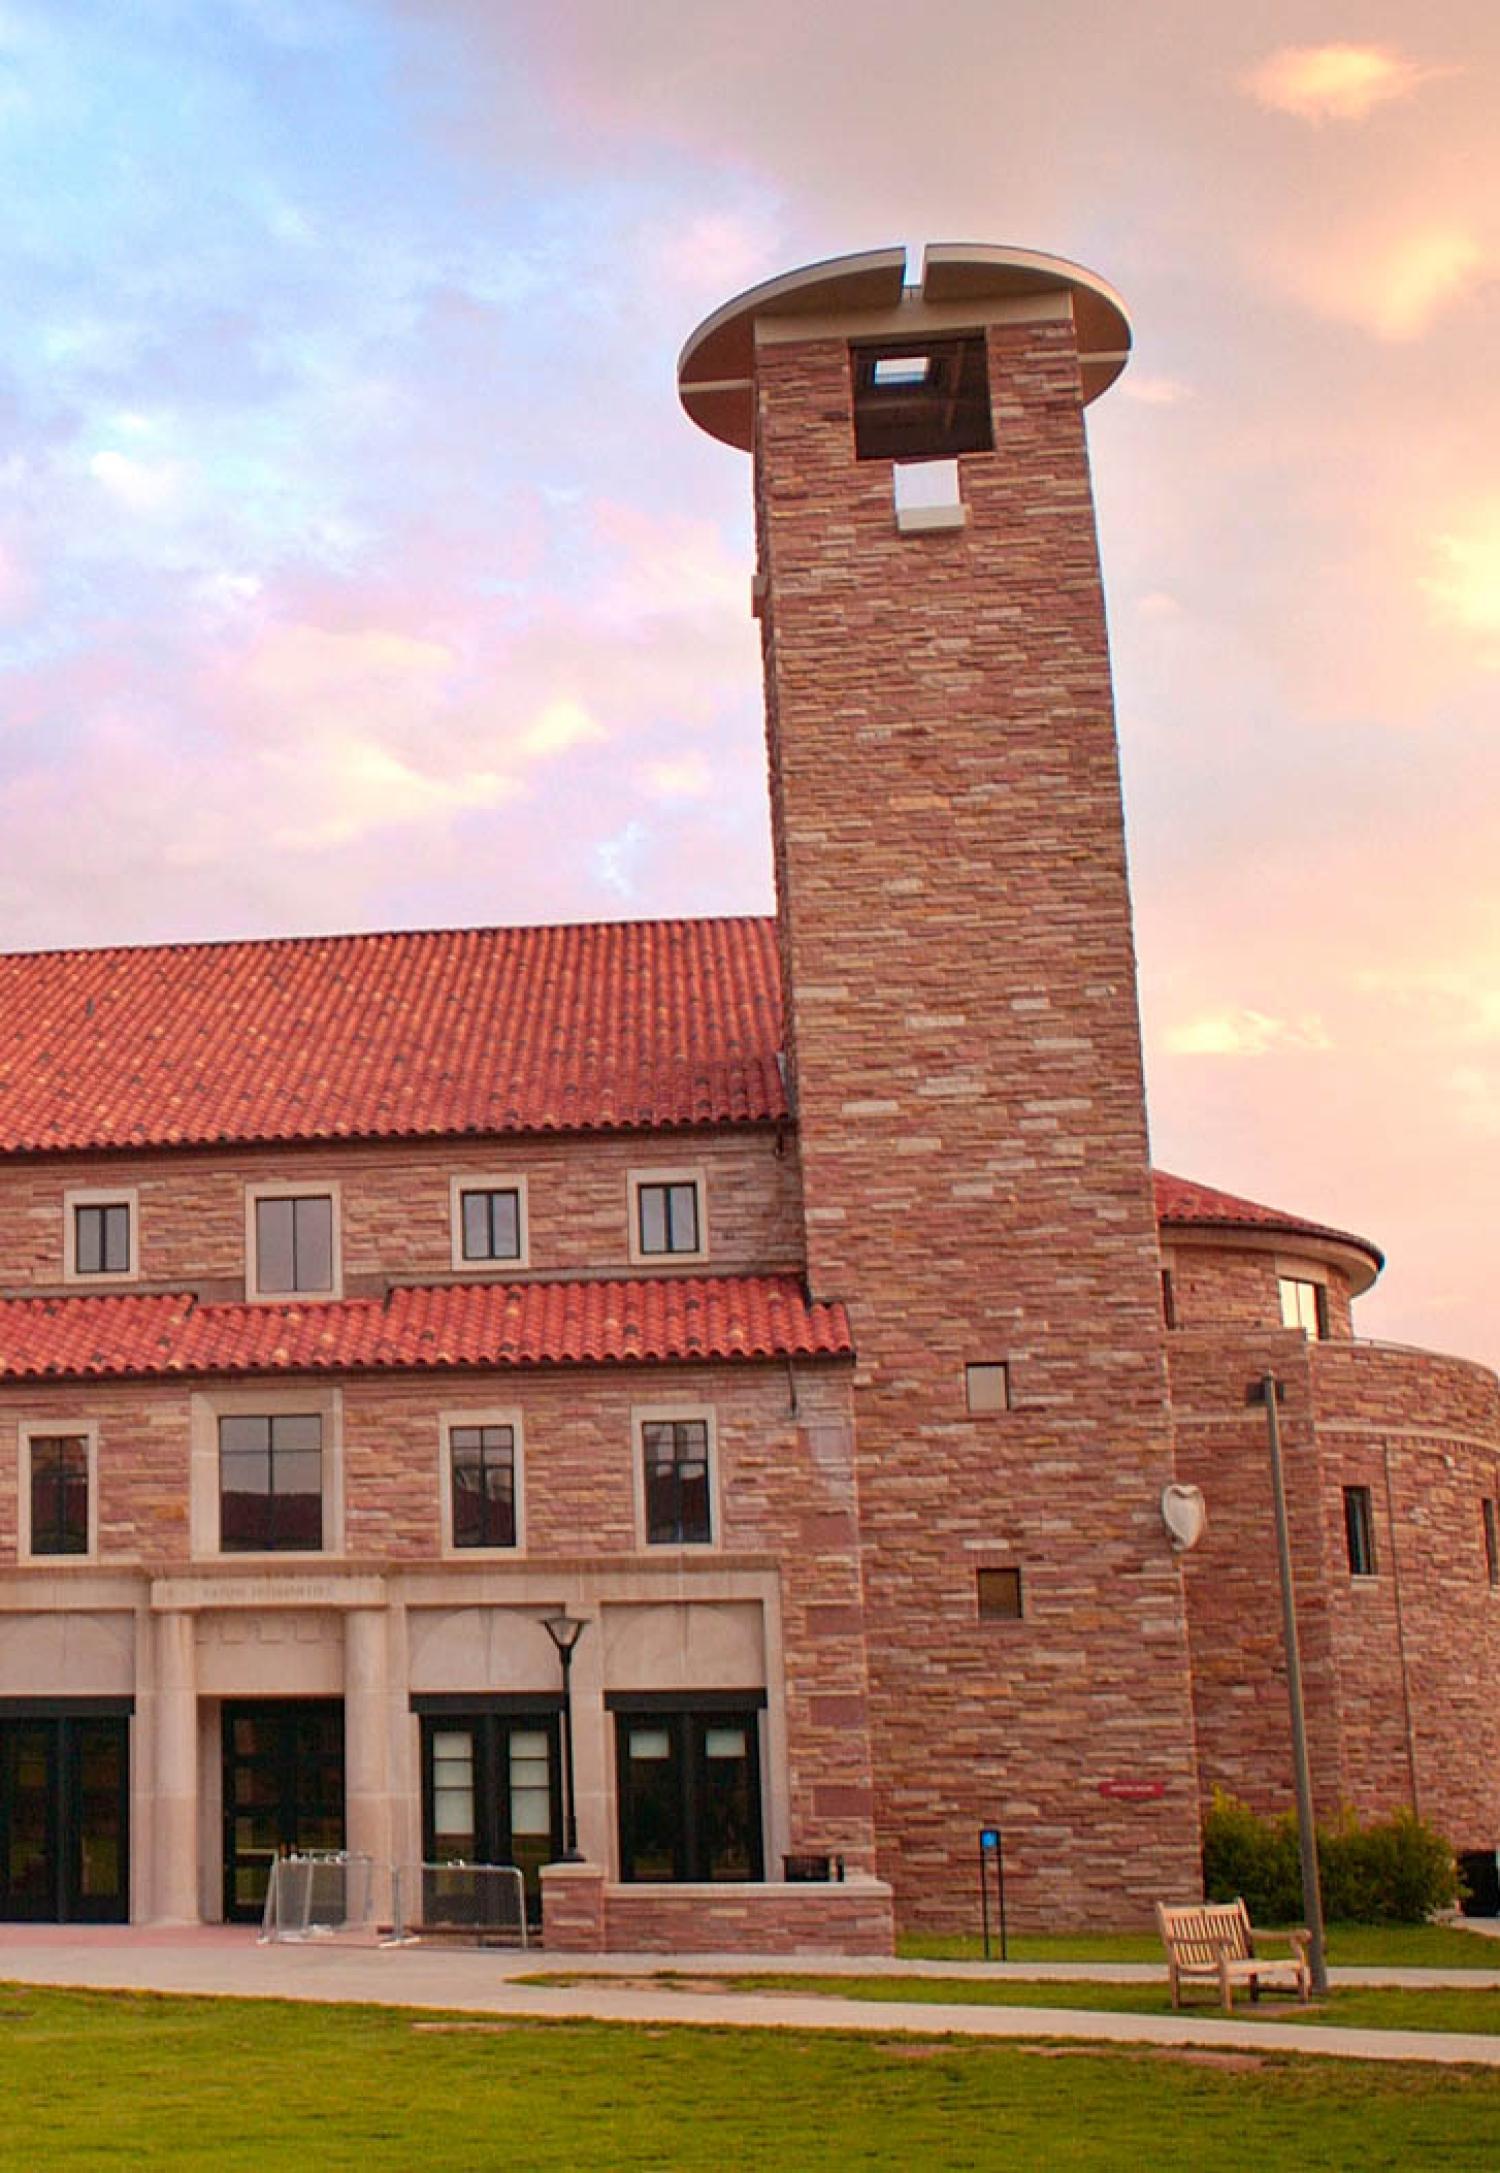 Sunrise at Eaton Humanities building